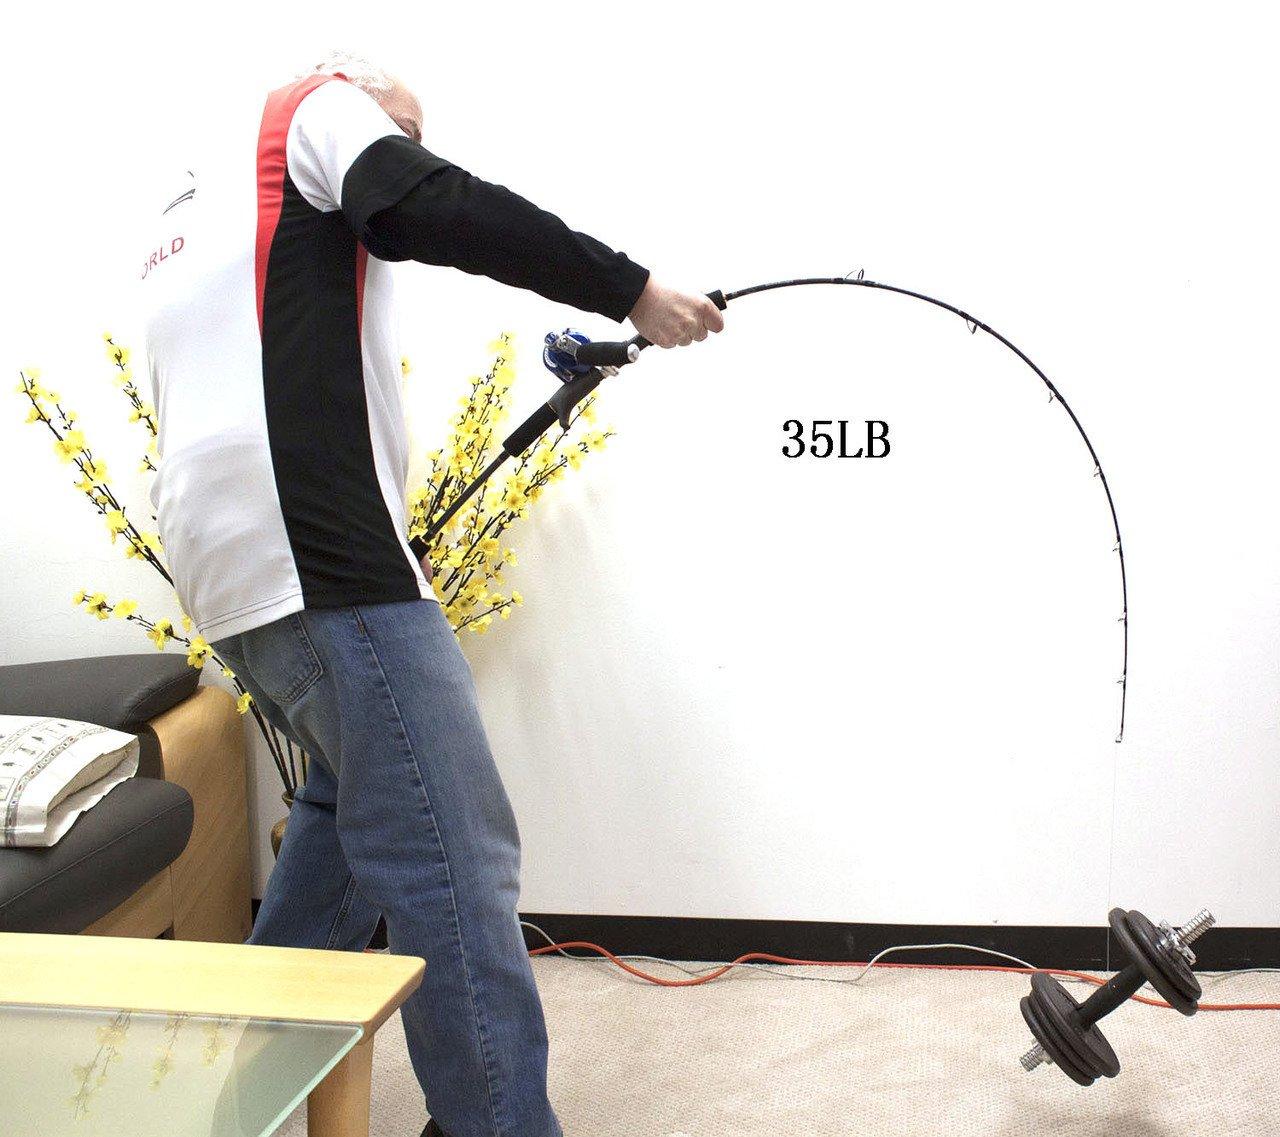 Jigging WorldゴーストハンターSlowピッチJiggingロッド300 g -350 G B0184PLOJ8 Slow Pitch 300g